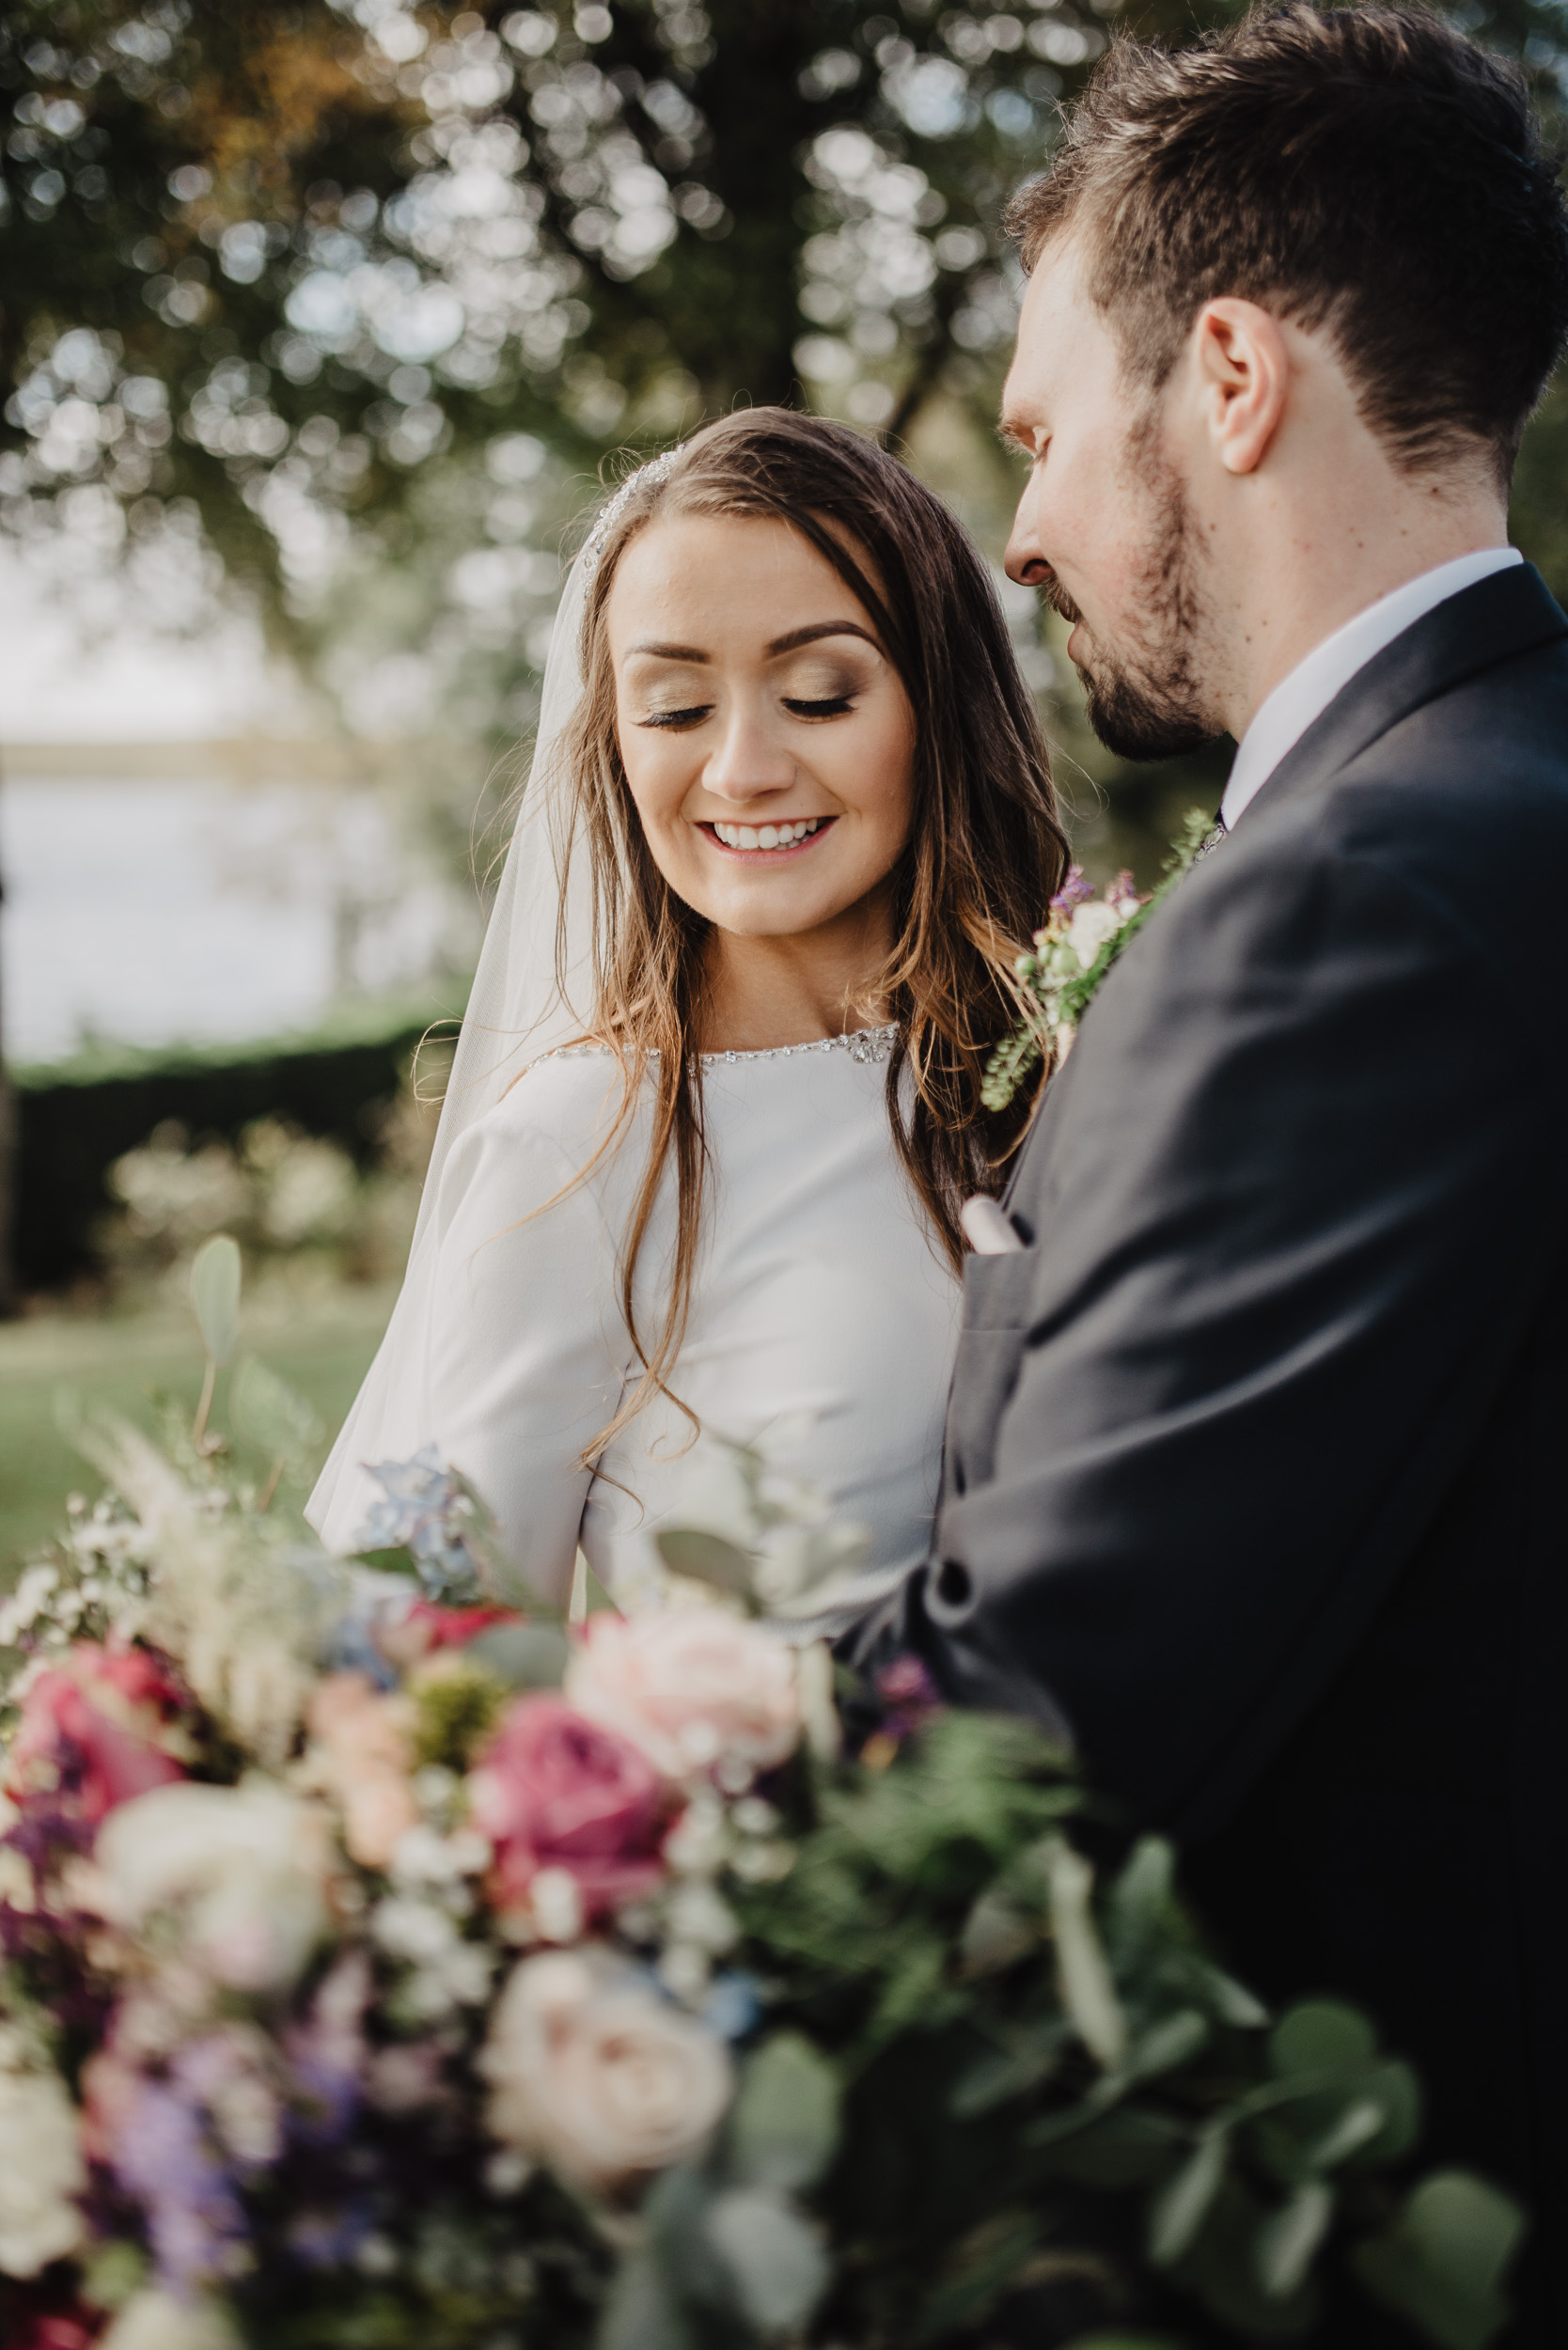 wedding photogaphy peter mackey 2018 sar-3.jpg